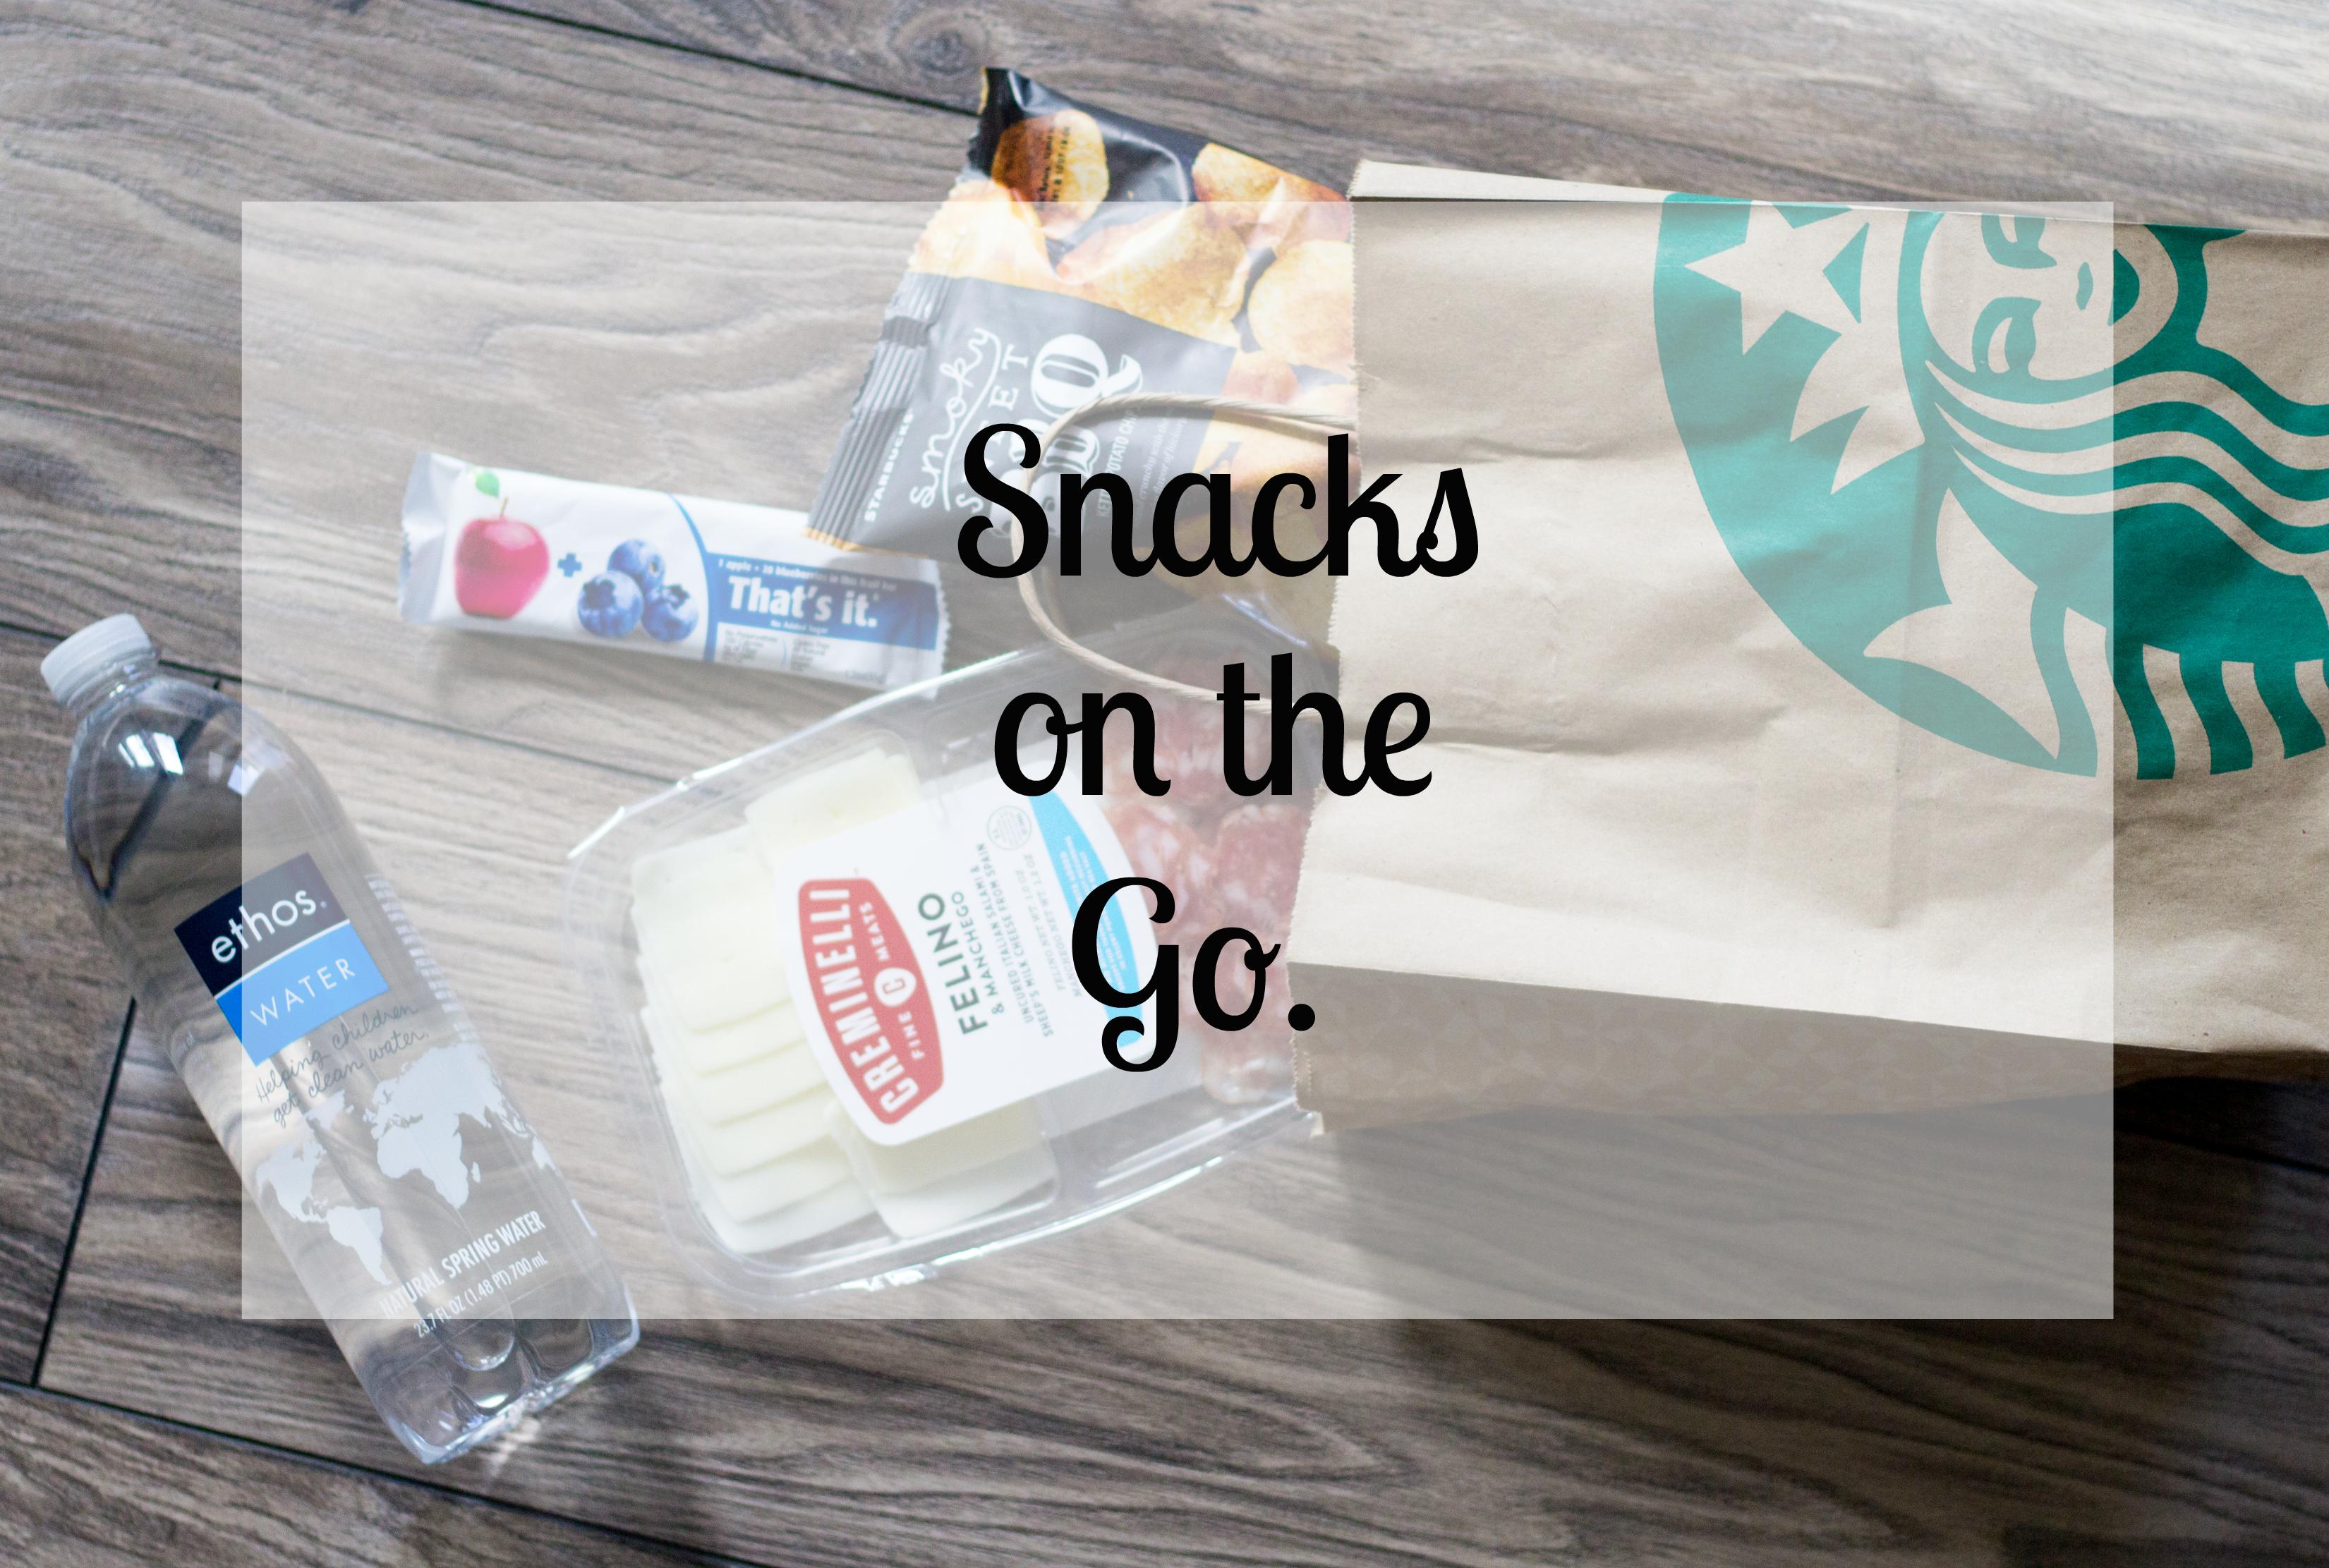 snacks on the go